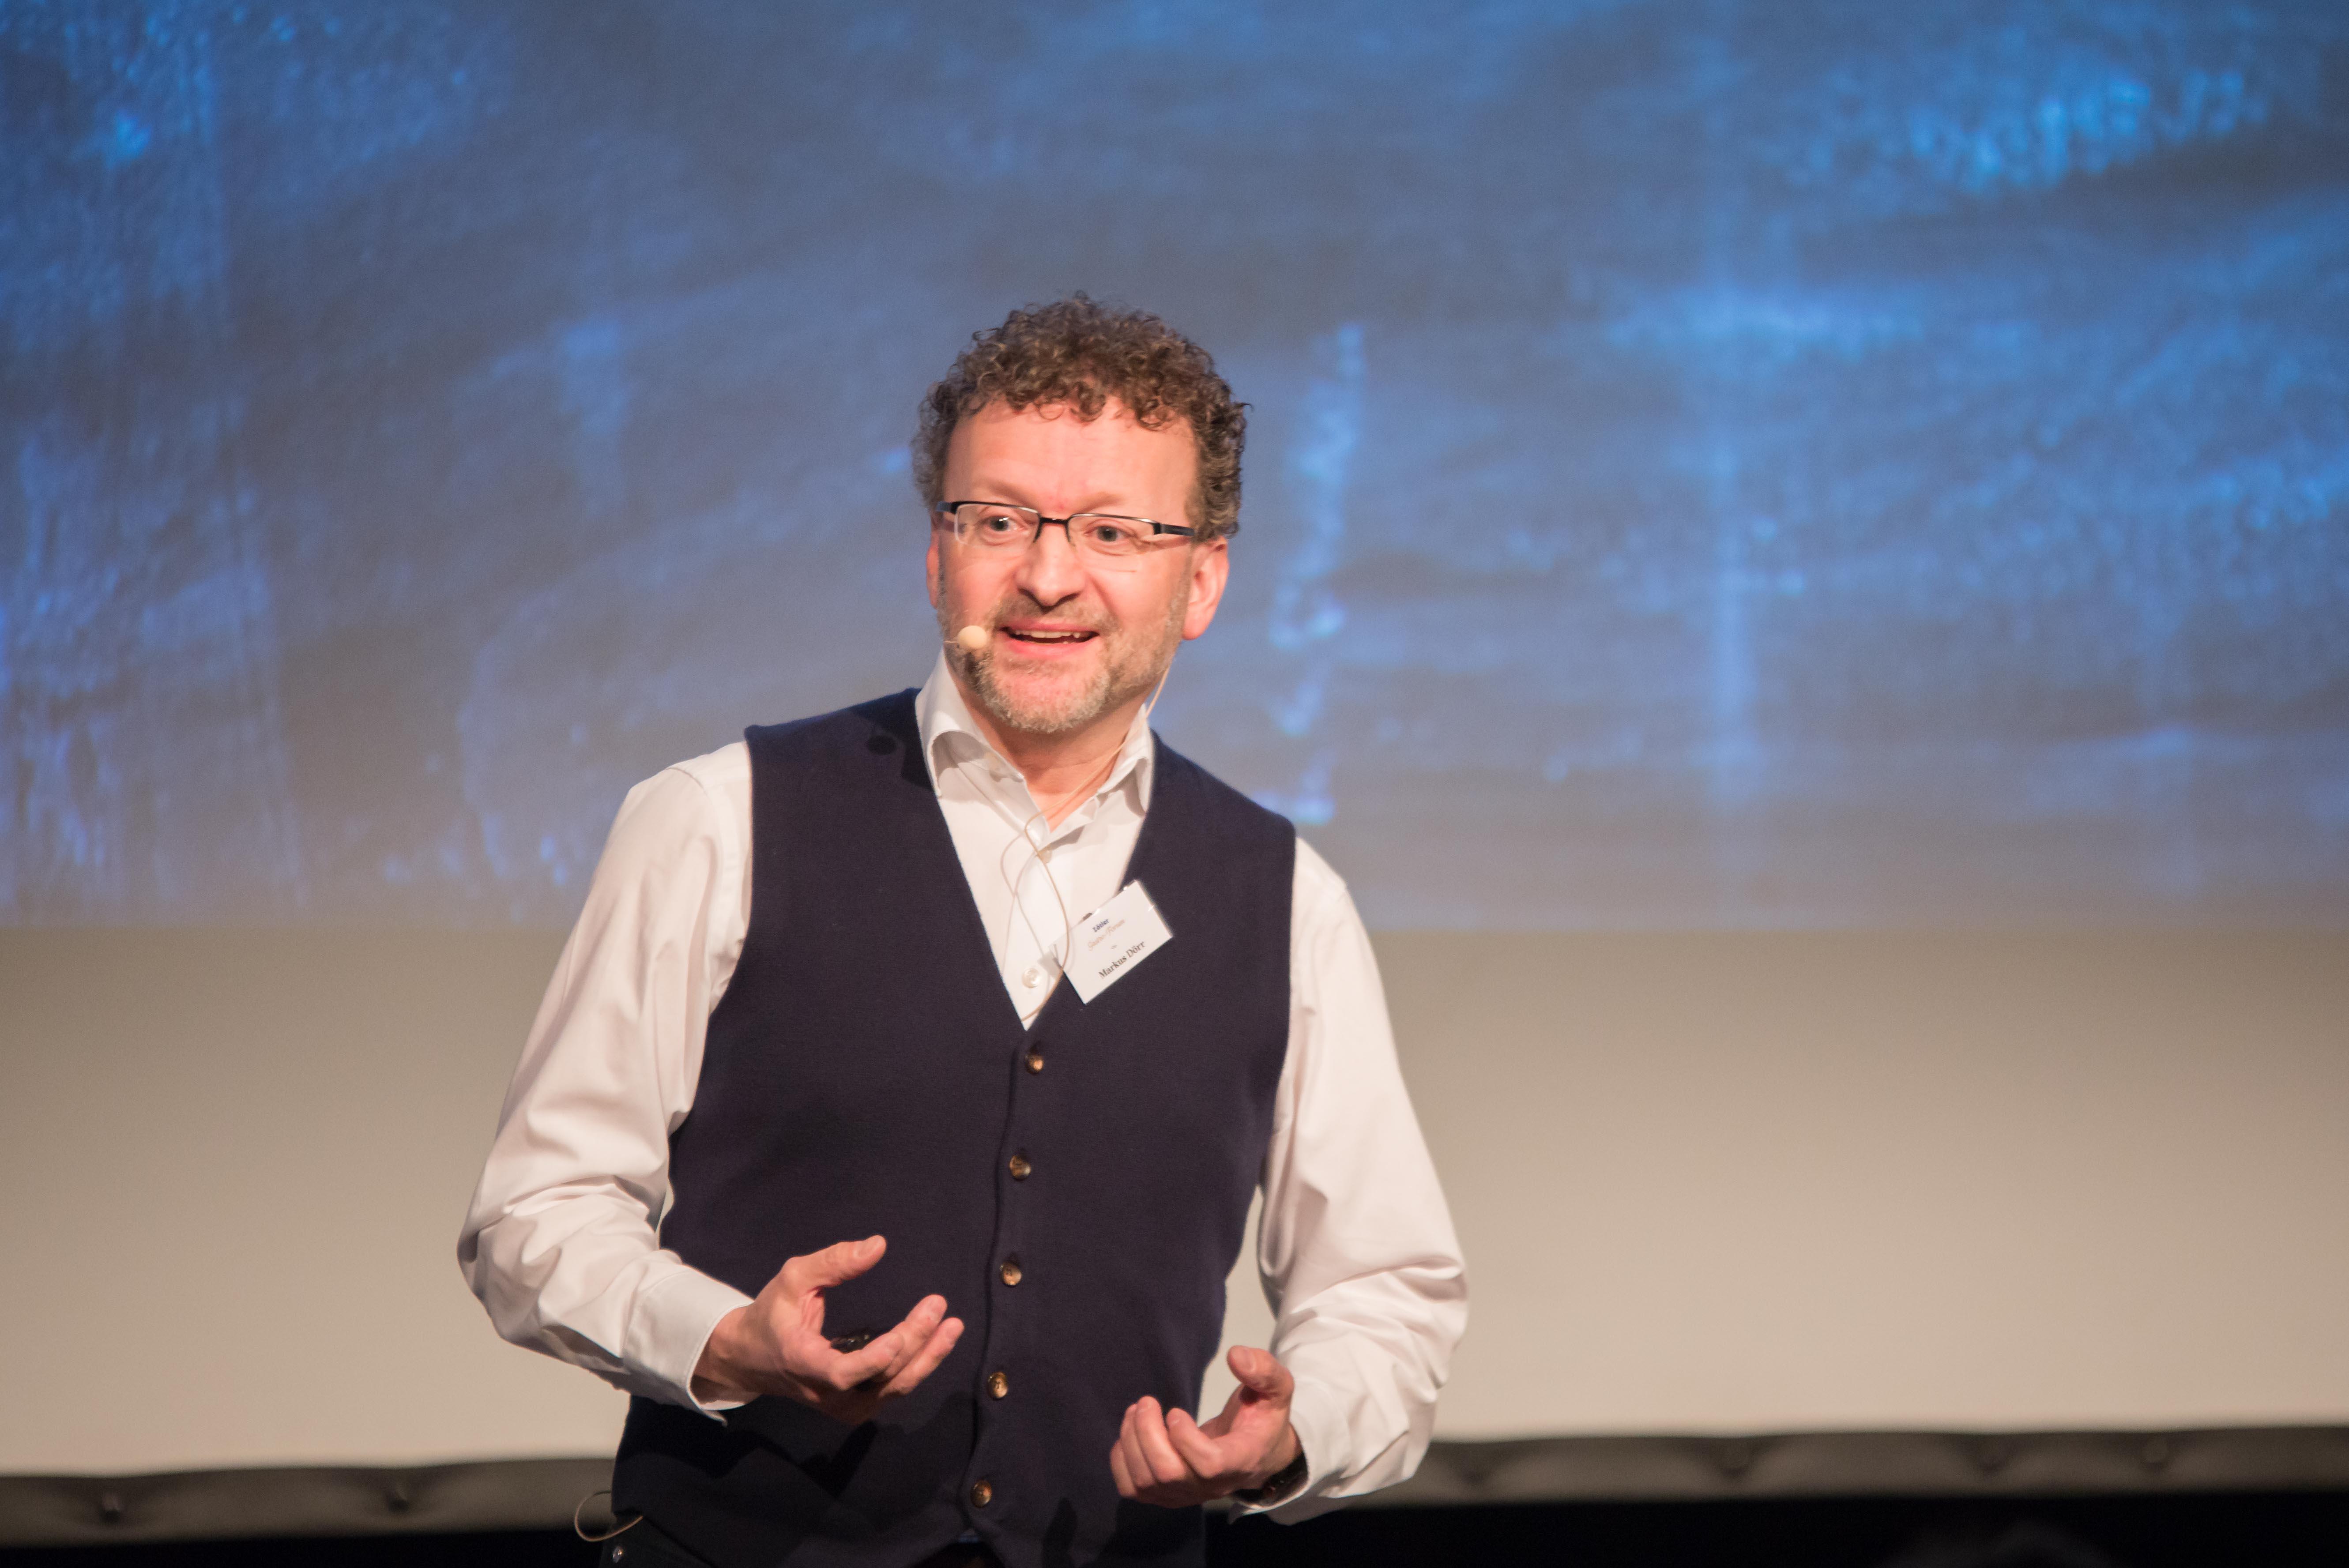 Expert Marketplace - Dipl. Psychologe Markus Dörr - Impressionen eins